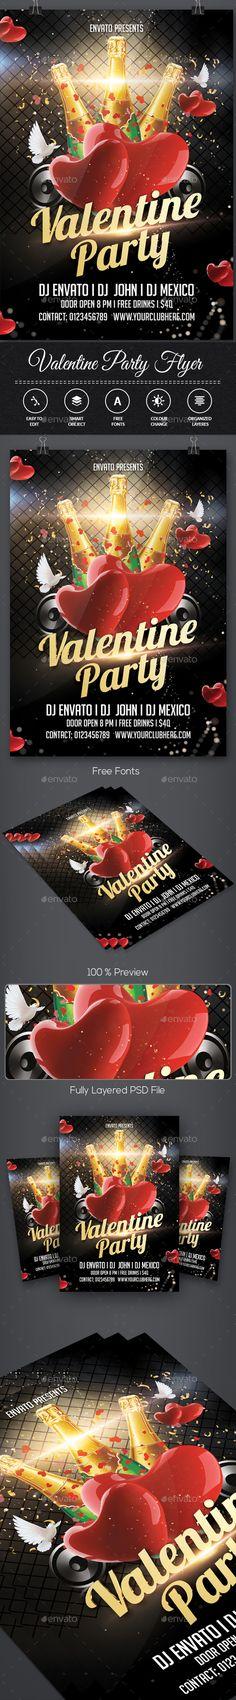 Valentine Day Flyer Template PSD. Download here: http://graphicriver.net/item/valentine-day-flyer/14810876?ref=ksioks